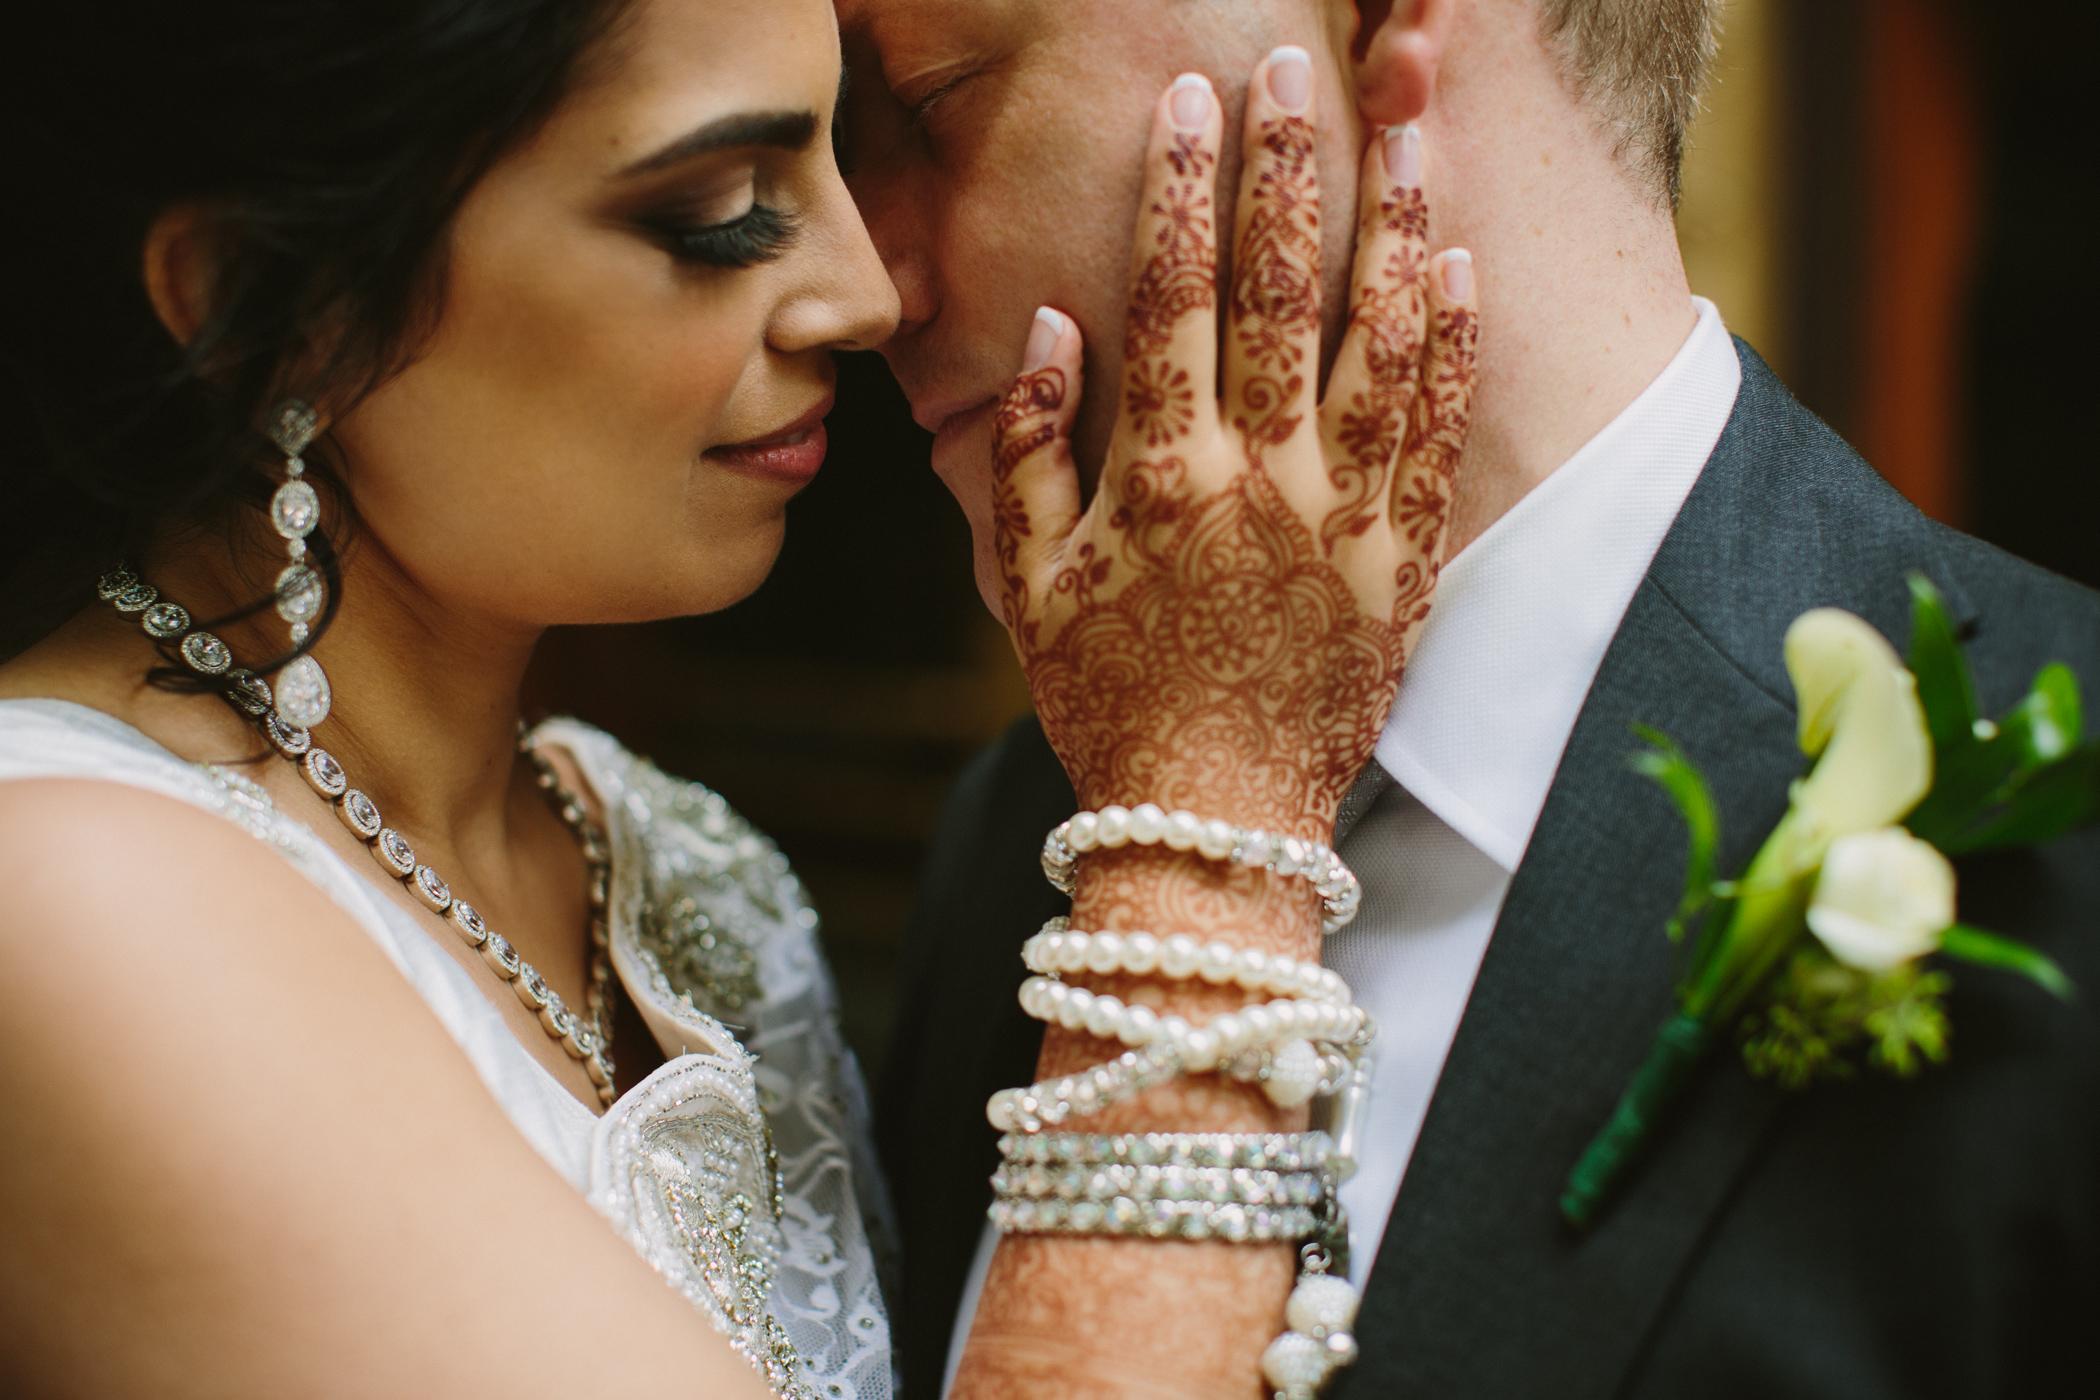 Vancouver Ismaili wedding photographer